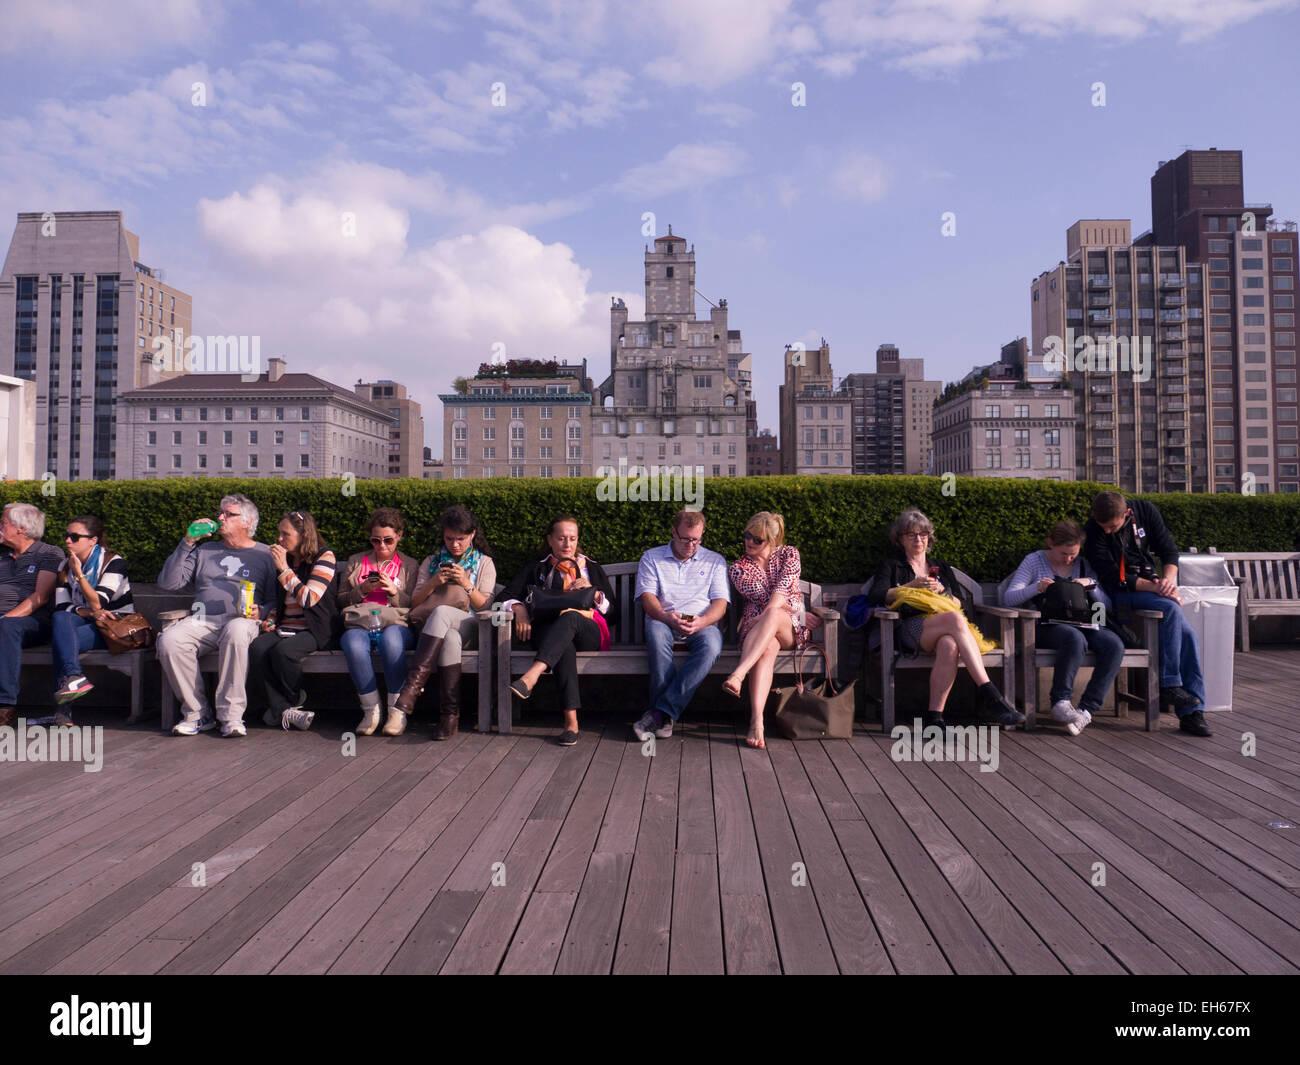 Roof Garden Café And Martini Bar, The Metropolitan Museum Of Art, New Stock Photo - Alamy